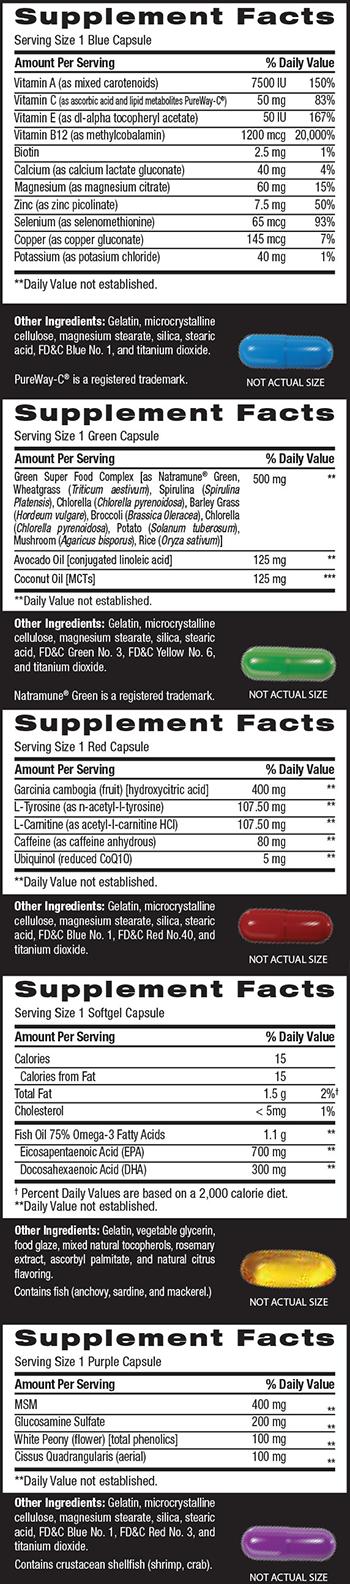 Cutler Nutrition ANABOL Supplement Facts